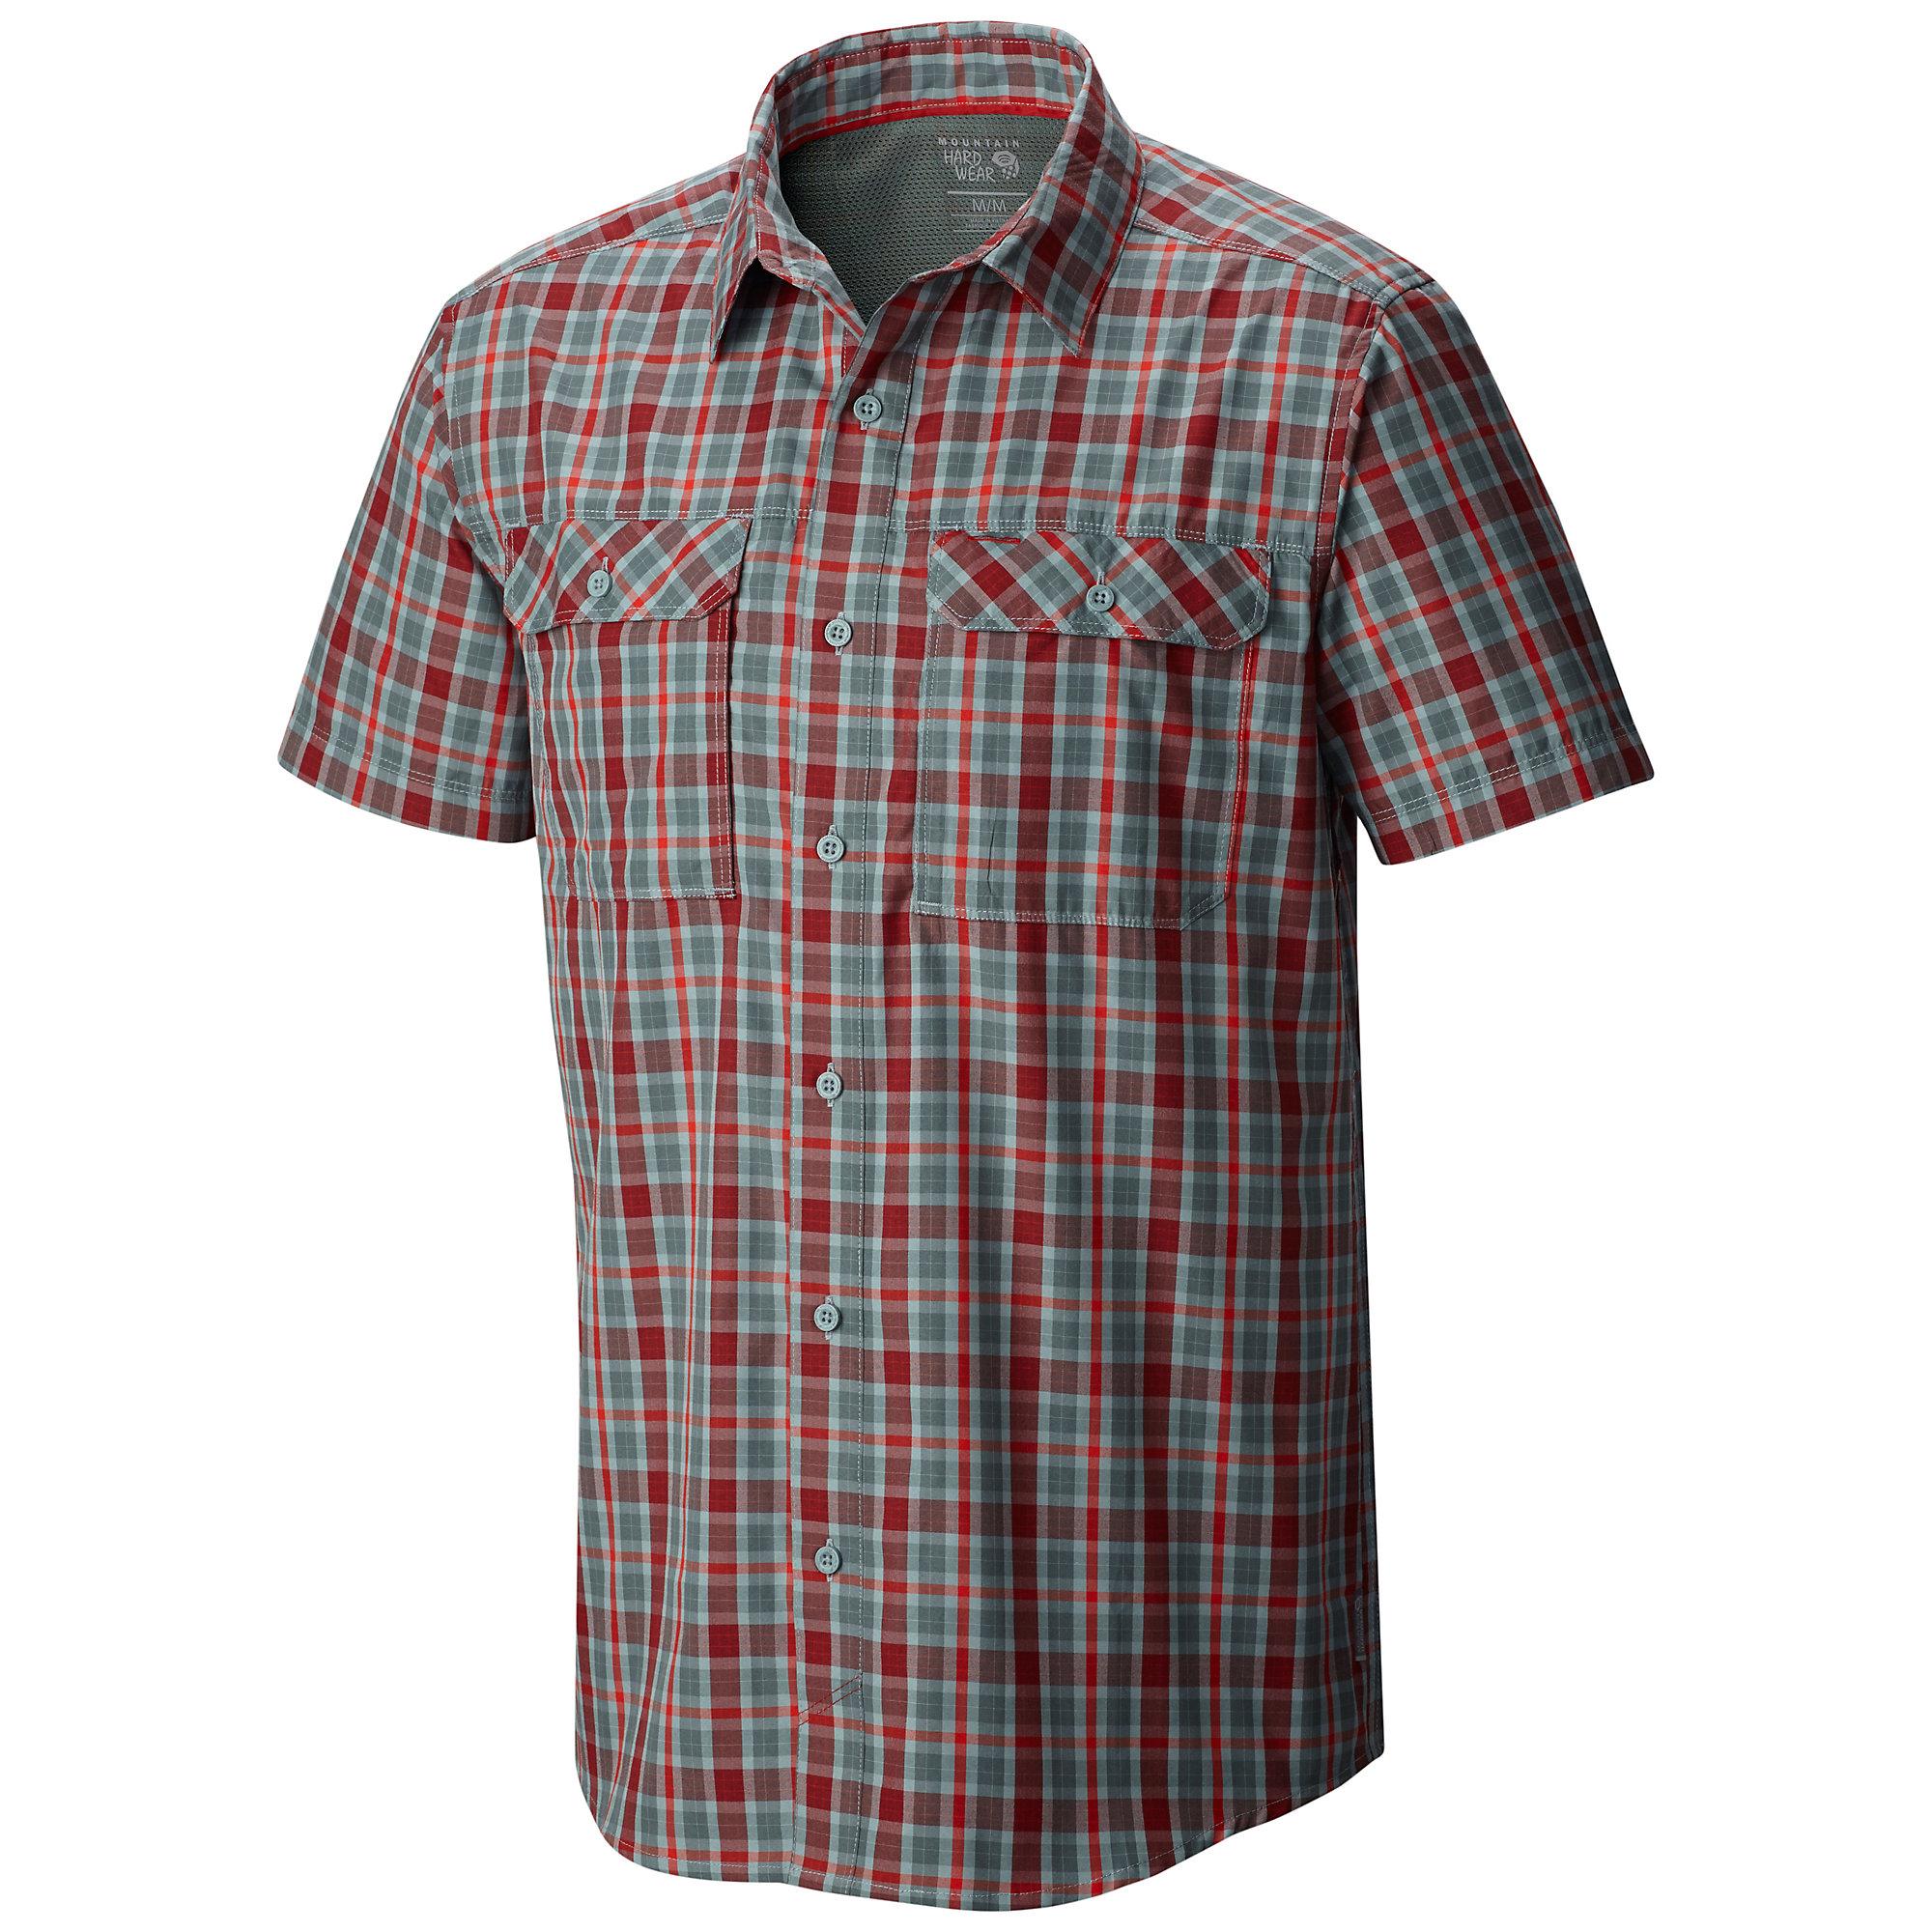 Mountain Hardwear Canyon Plaid Short Sleeve Shirt